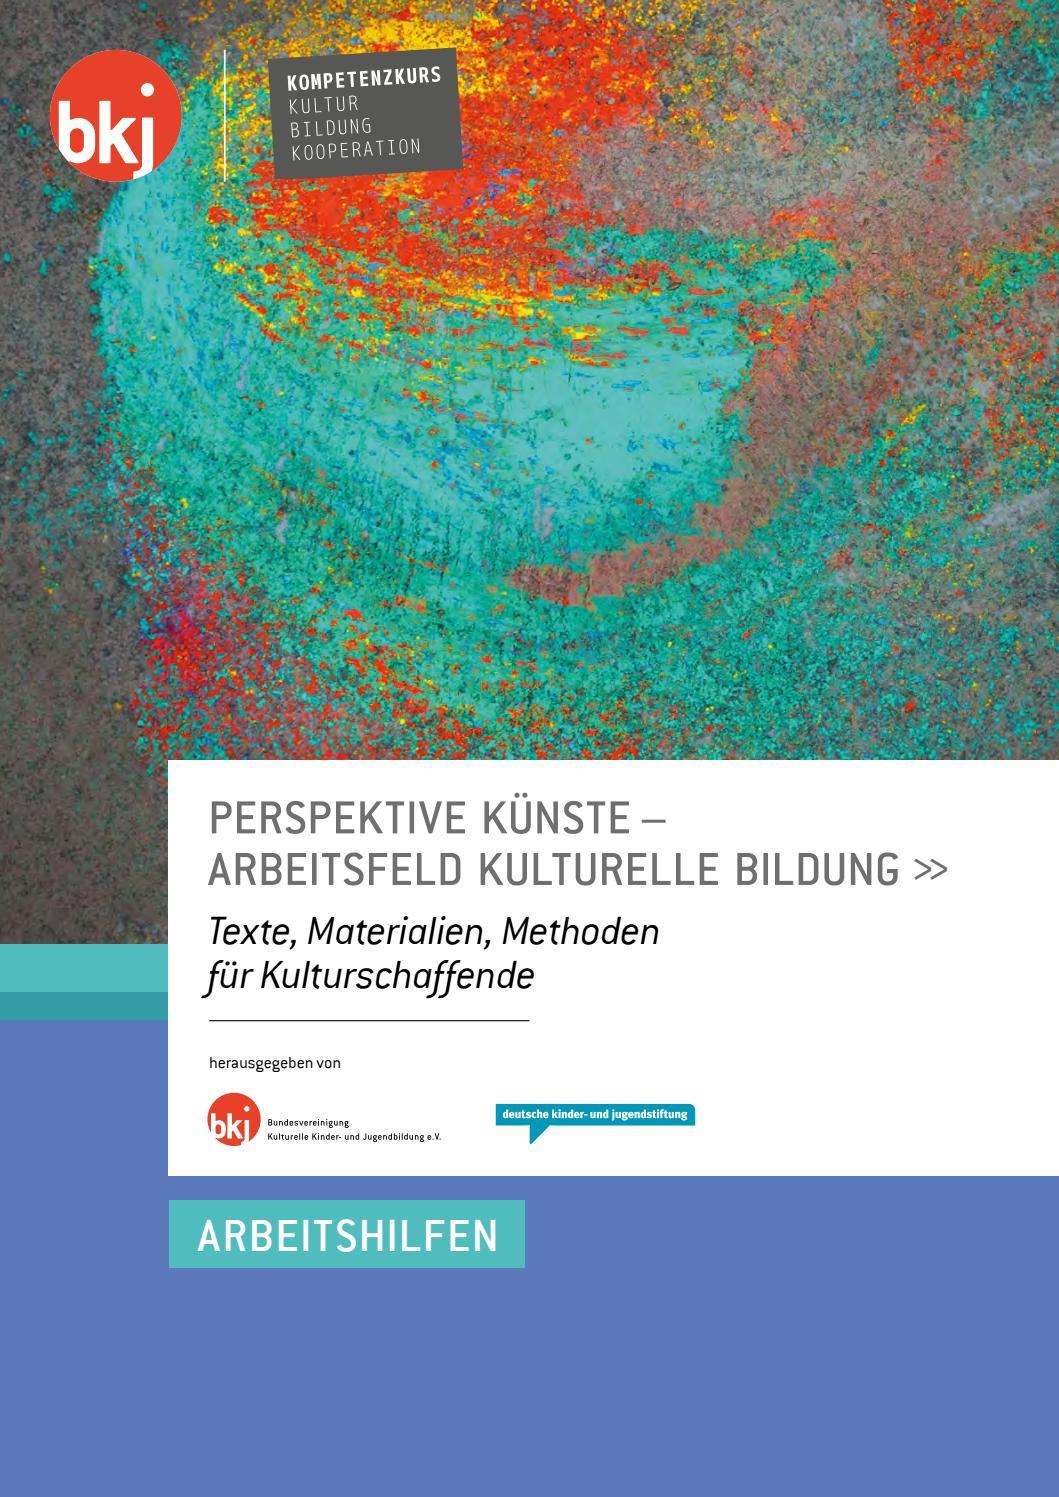 Perspektive Künste - Arbeitsfeld Kulturelle Bildung by BKJ e. V. - issuu